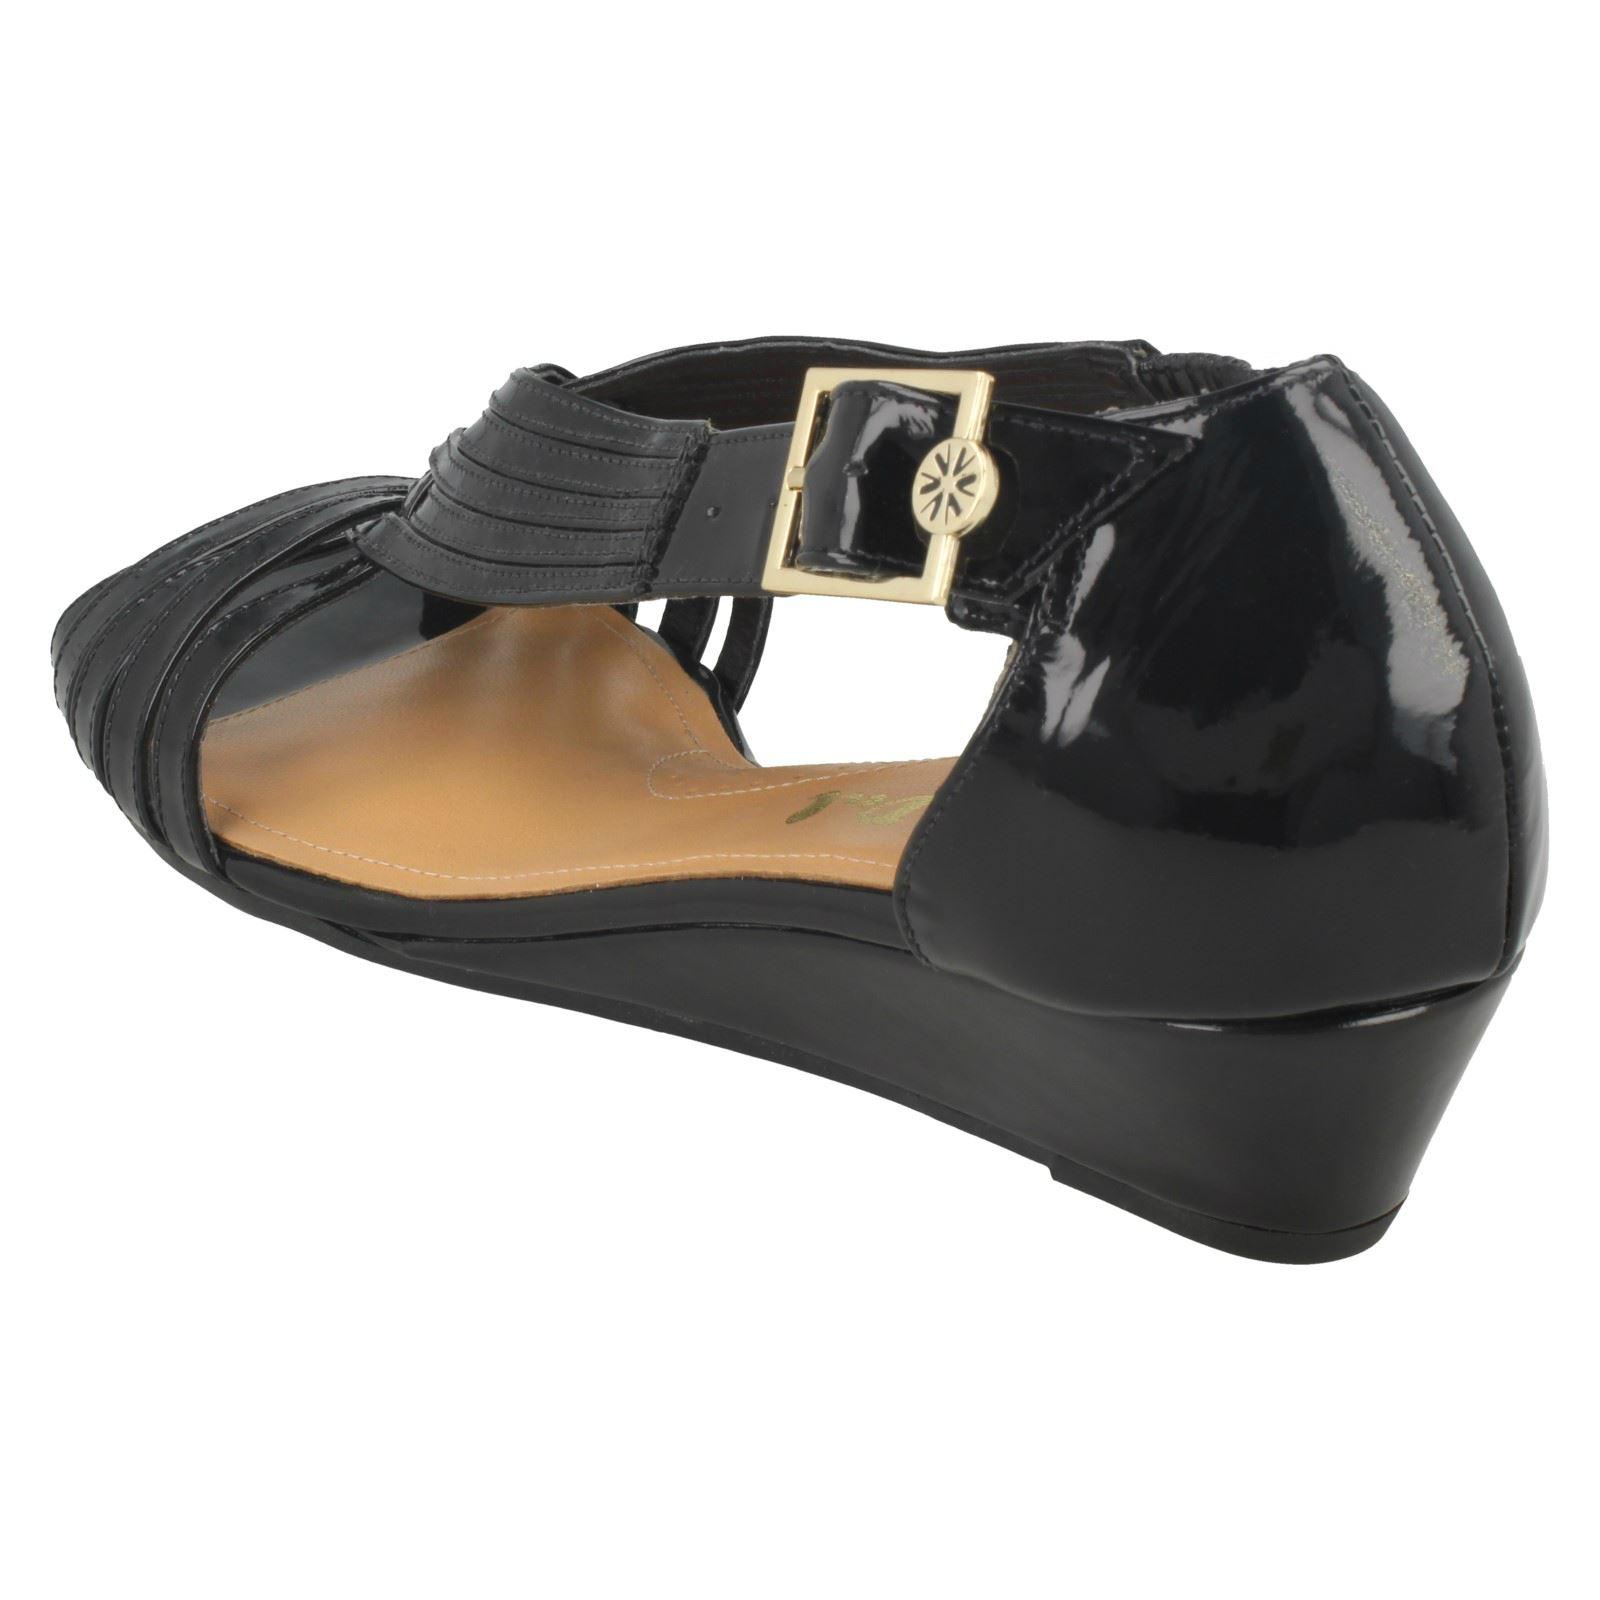 Ladies-Van-Dal-Wedge-Strappy-Sandals-Lucie thumbnail 4